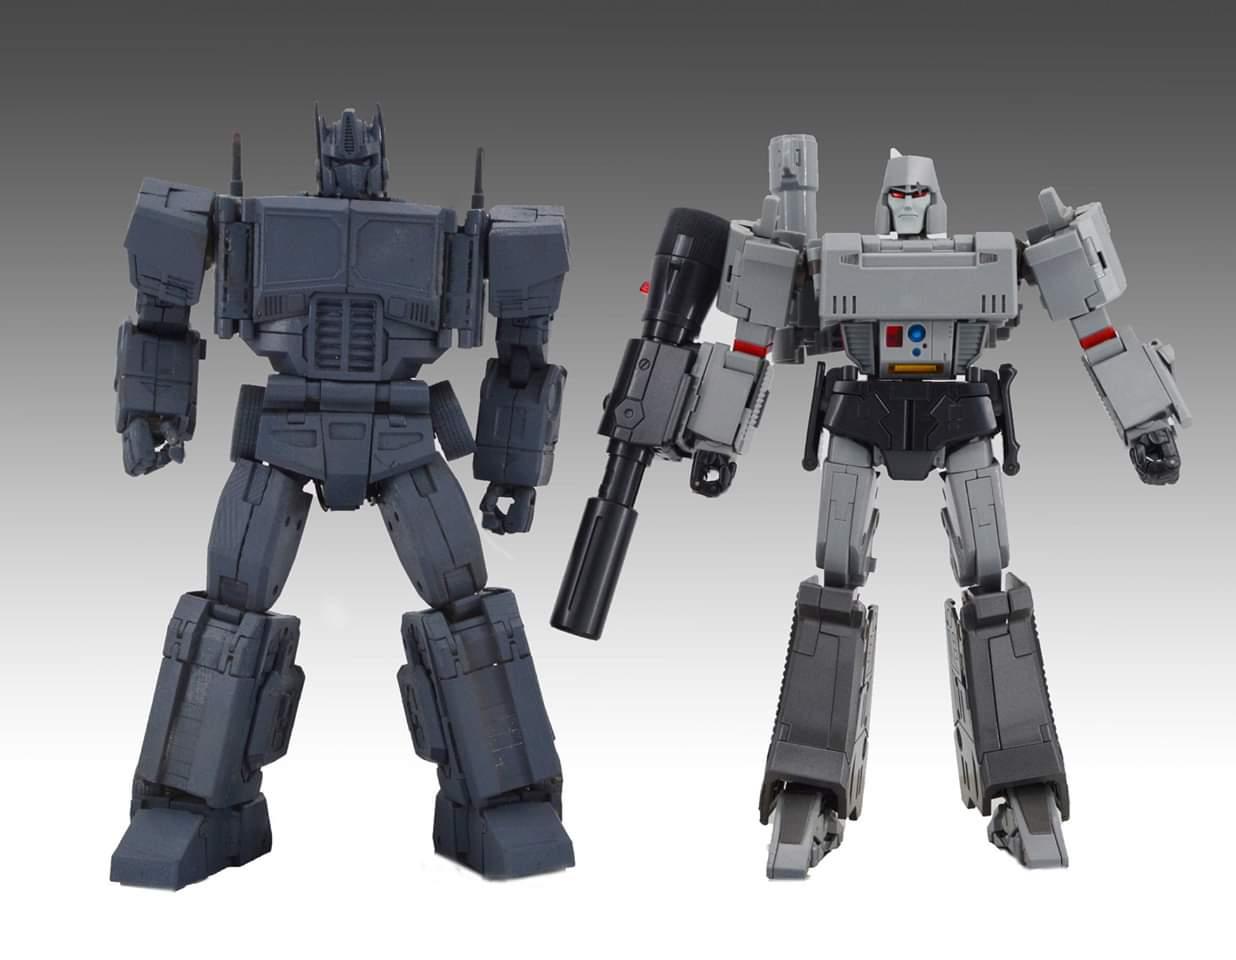 [KFC Toys] Produit Tiers - PC-14 Raijin + PC-15 Grand Raijin + P-16 Raiju - aka Ginrai (Powermaster Optimus) + Remorque de Ginrai + Godbomber = God Ginrai (TF Masterforce) PqnyGXru_o